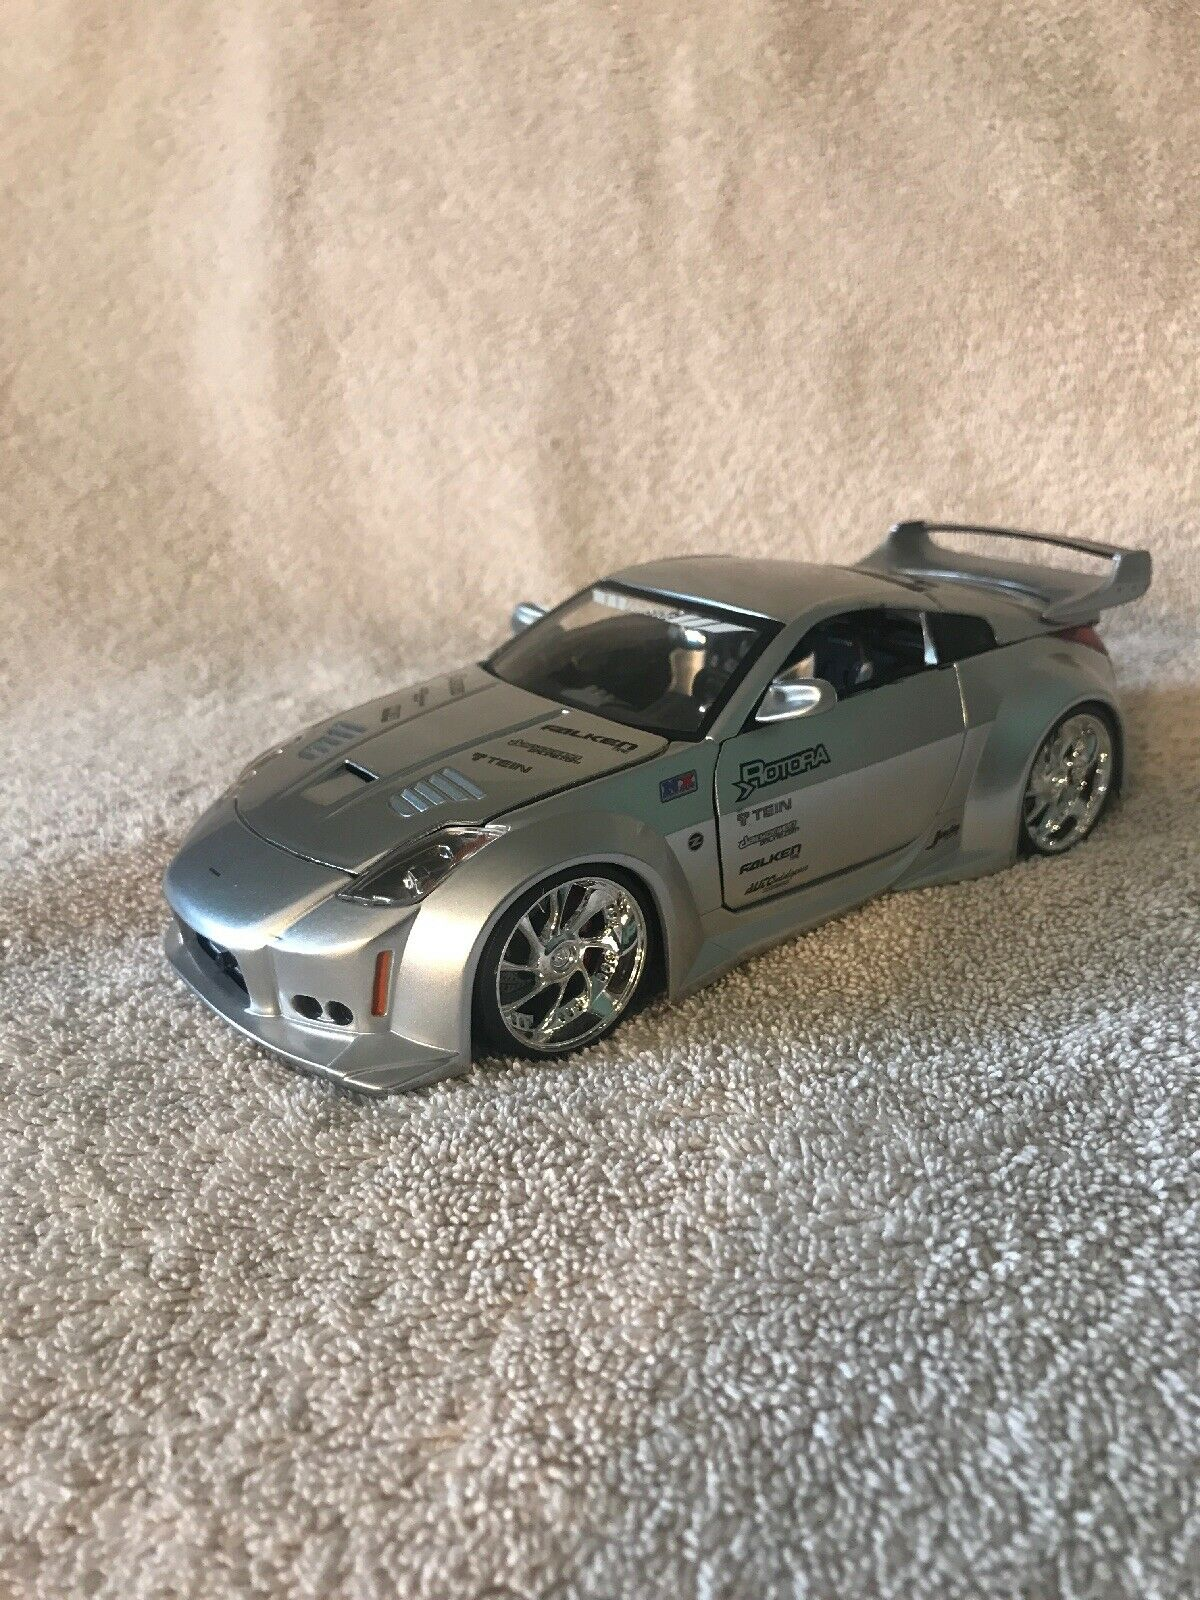 Jada giocattoli Import Racer 1 24 DIE CAST NISSAN Z argentoo  509909 molto difficile da trovare  greadt auto